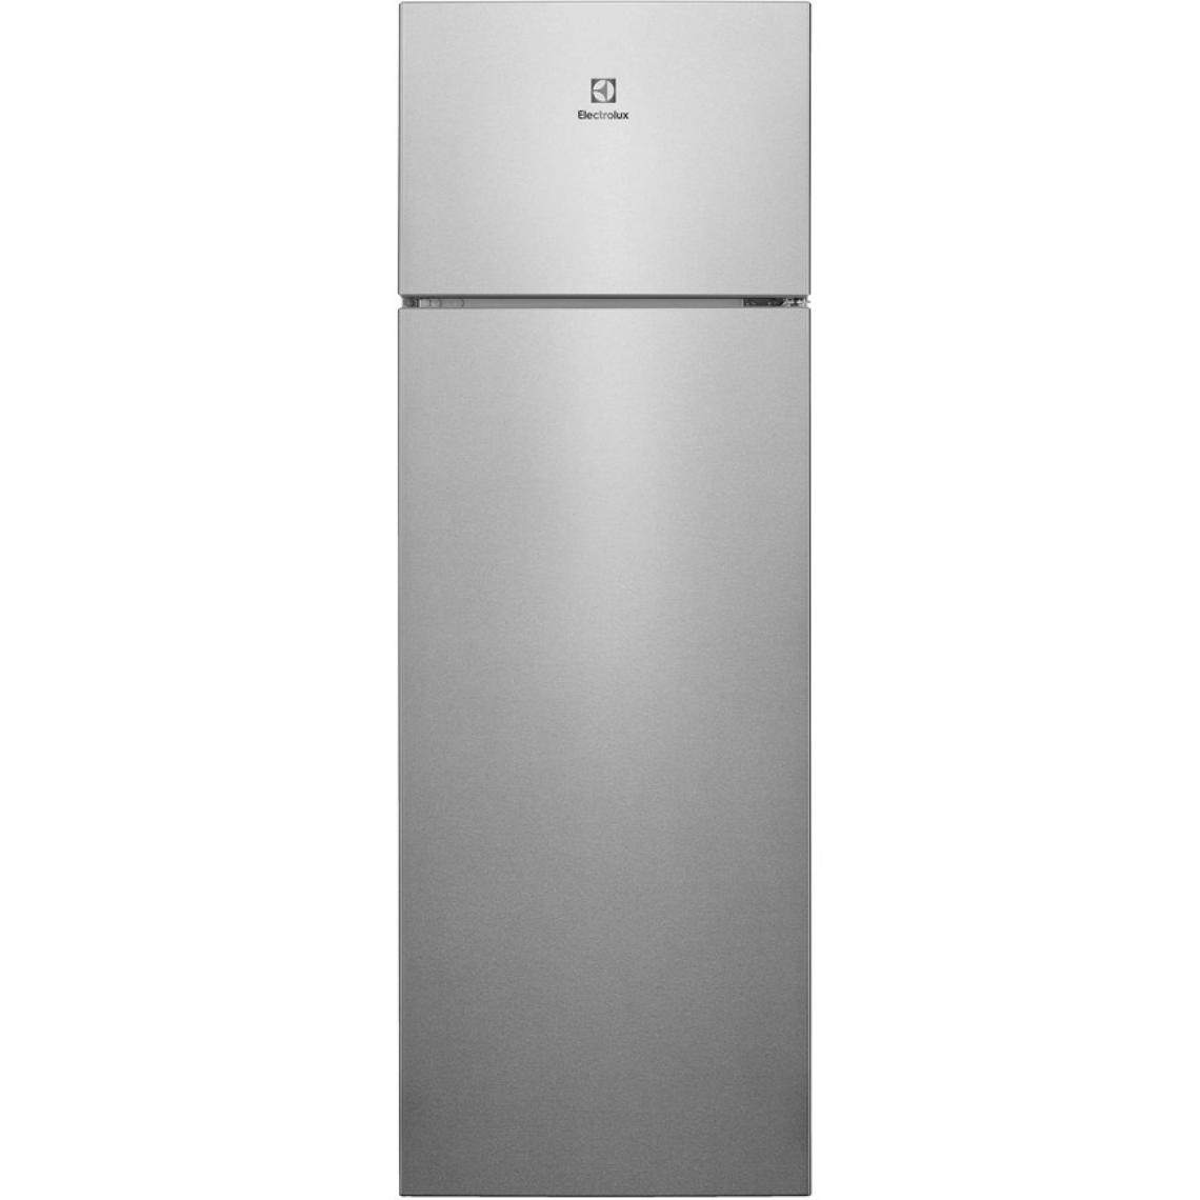 Electrolux Réfrigérateur 2 portes ELECTROLUX, LTB1AF28U0